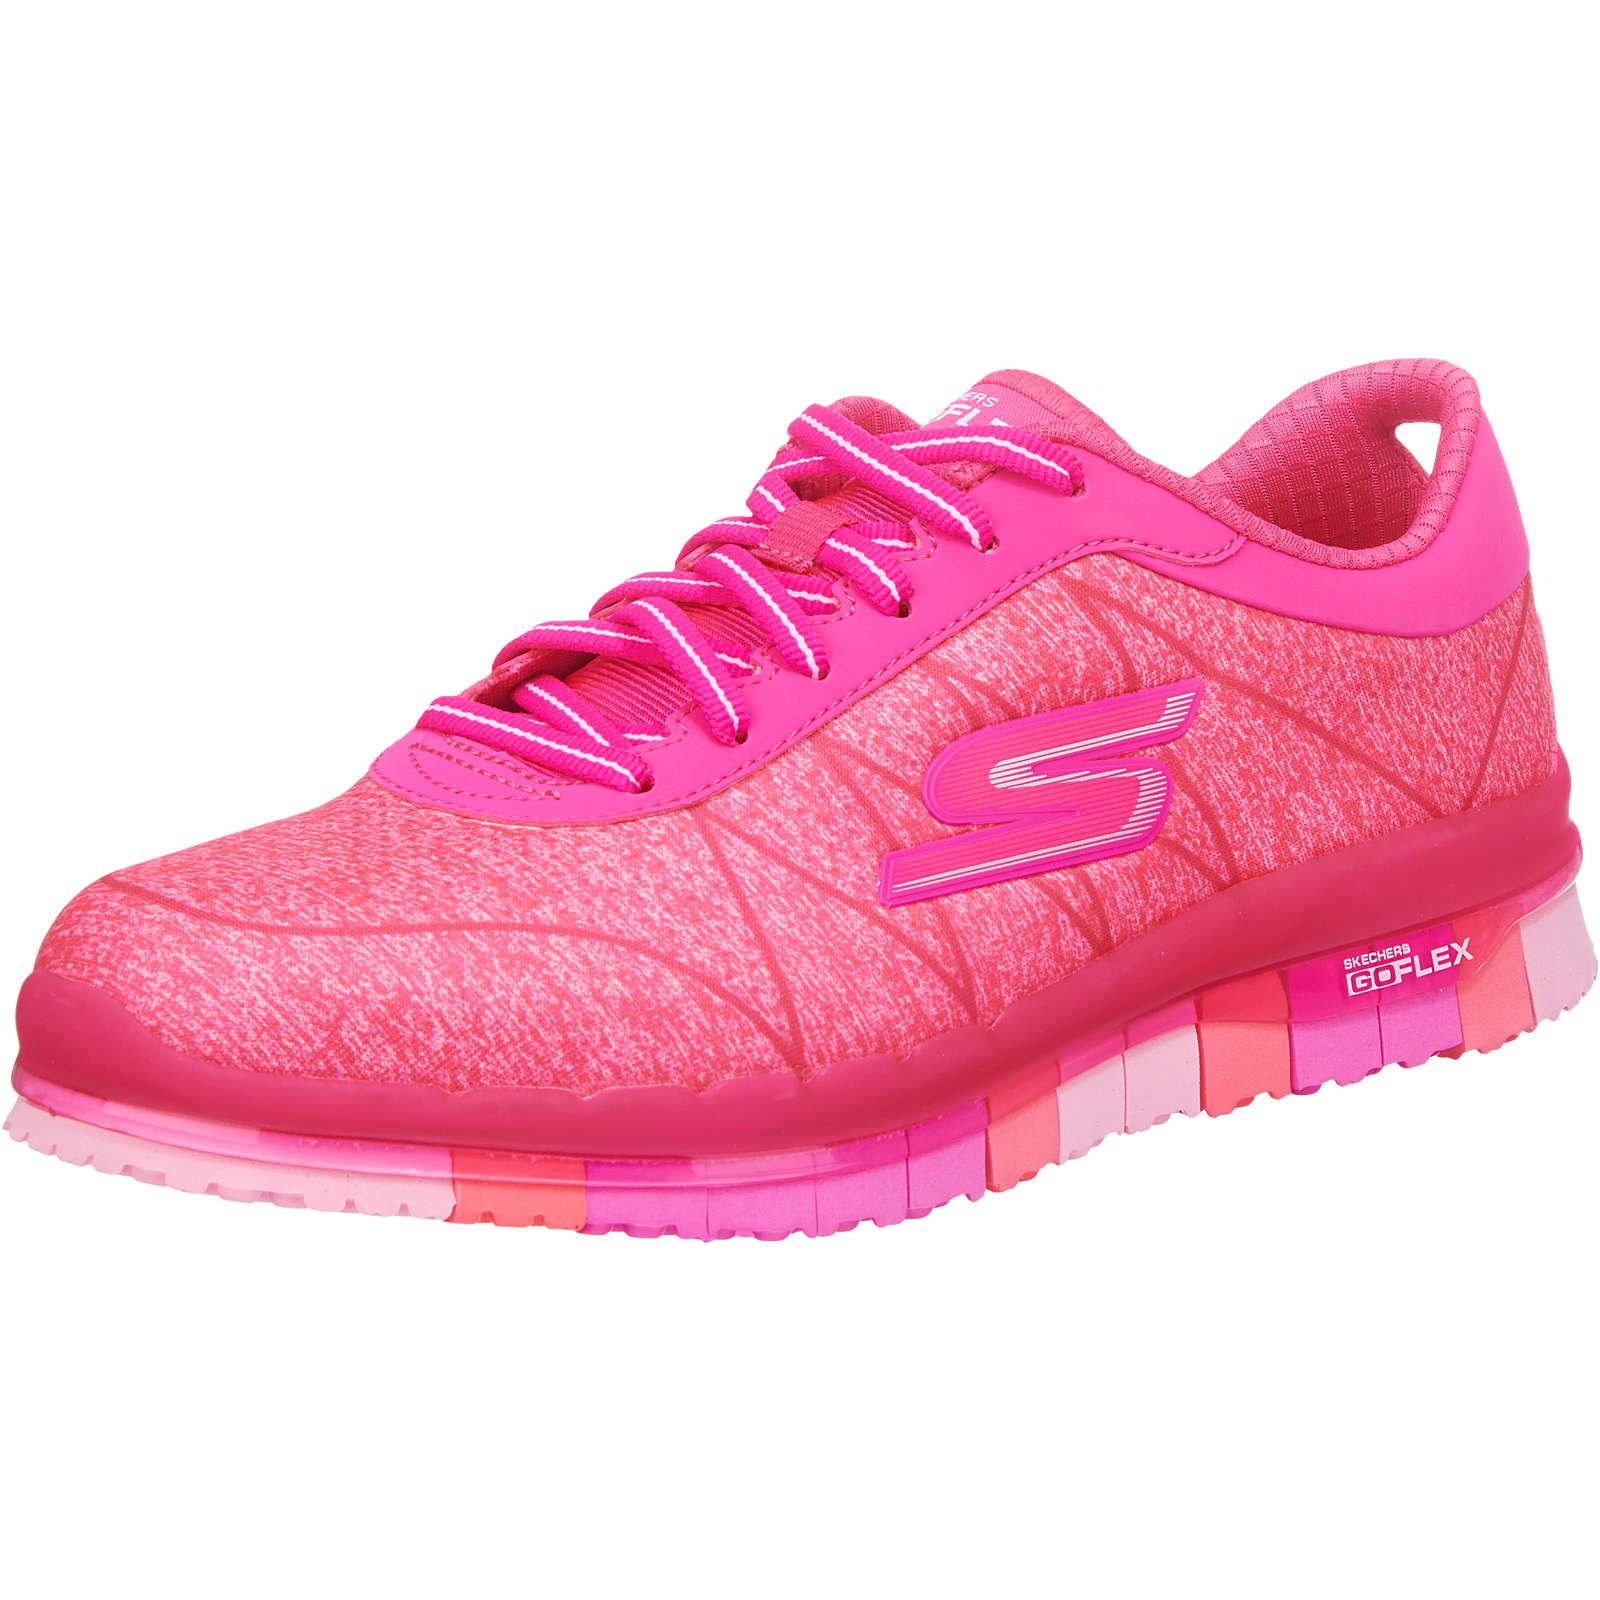 SKECHERS GO Flex Ability Sportschuhe pink Damen Gr. 40